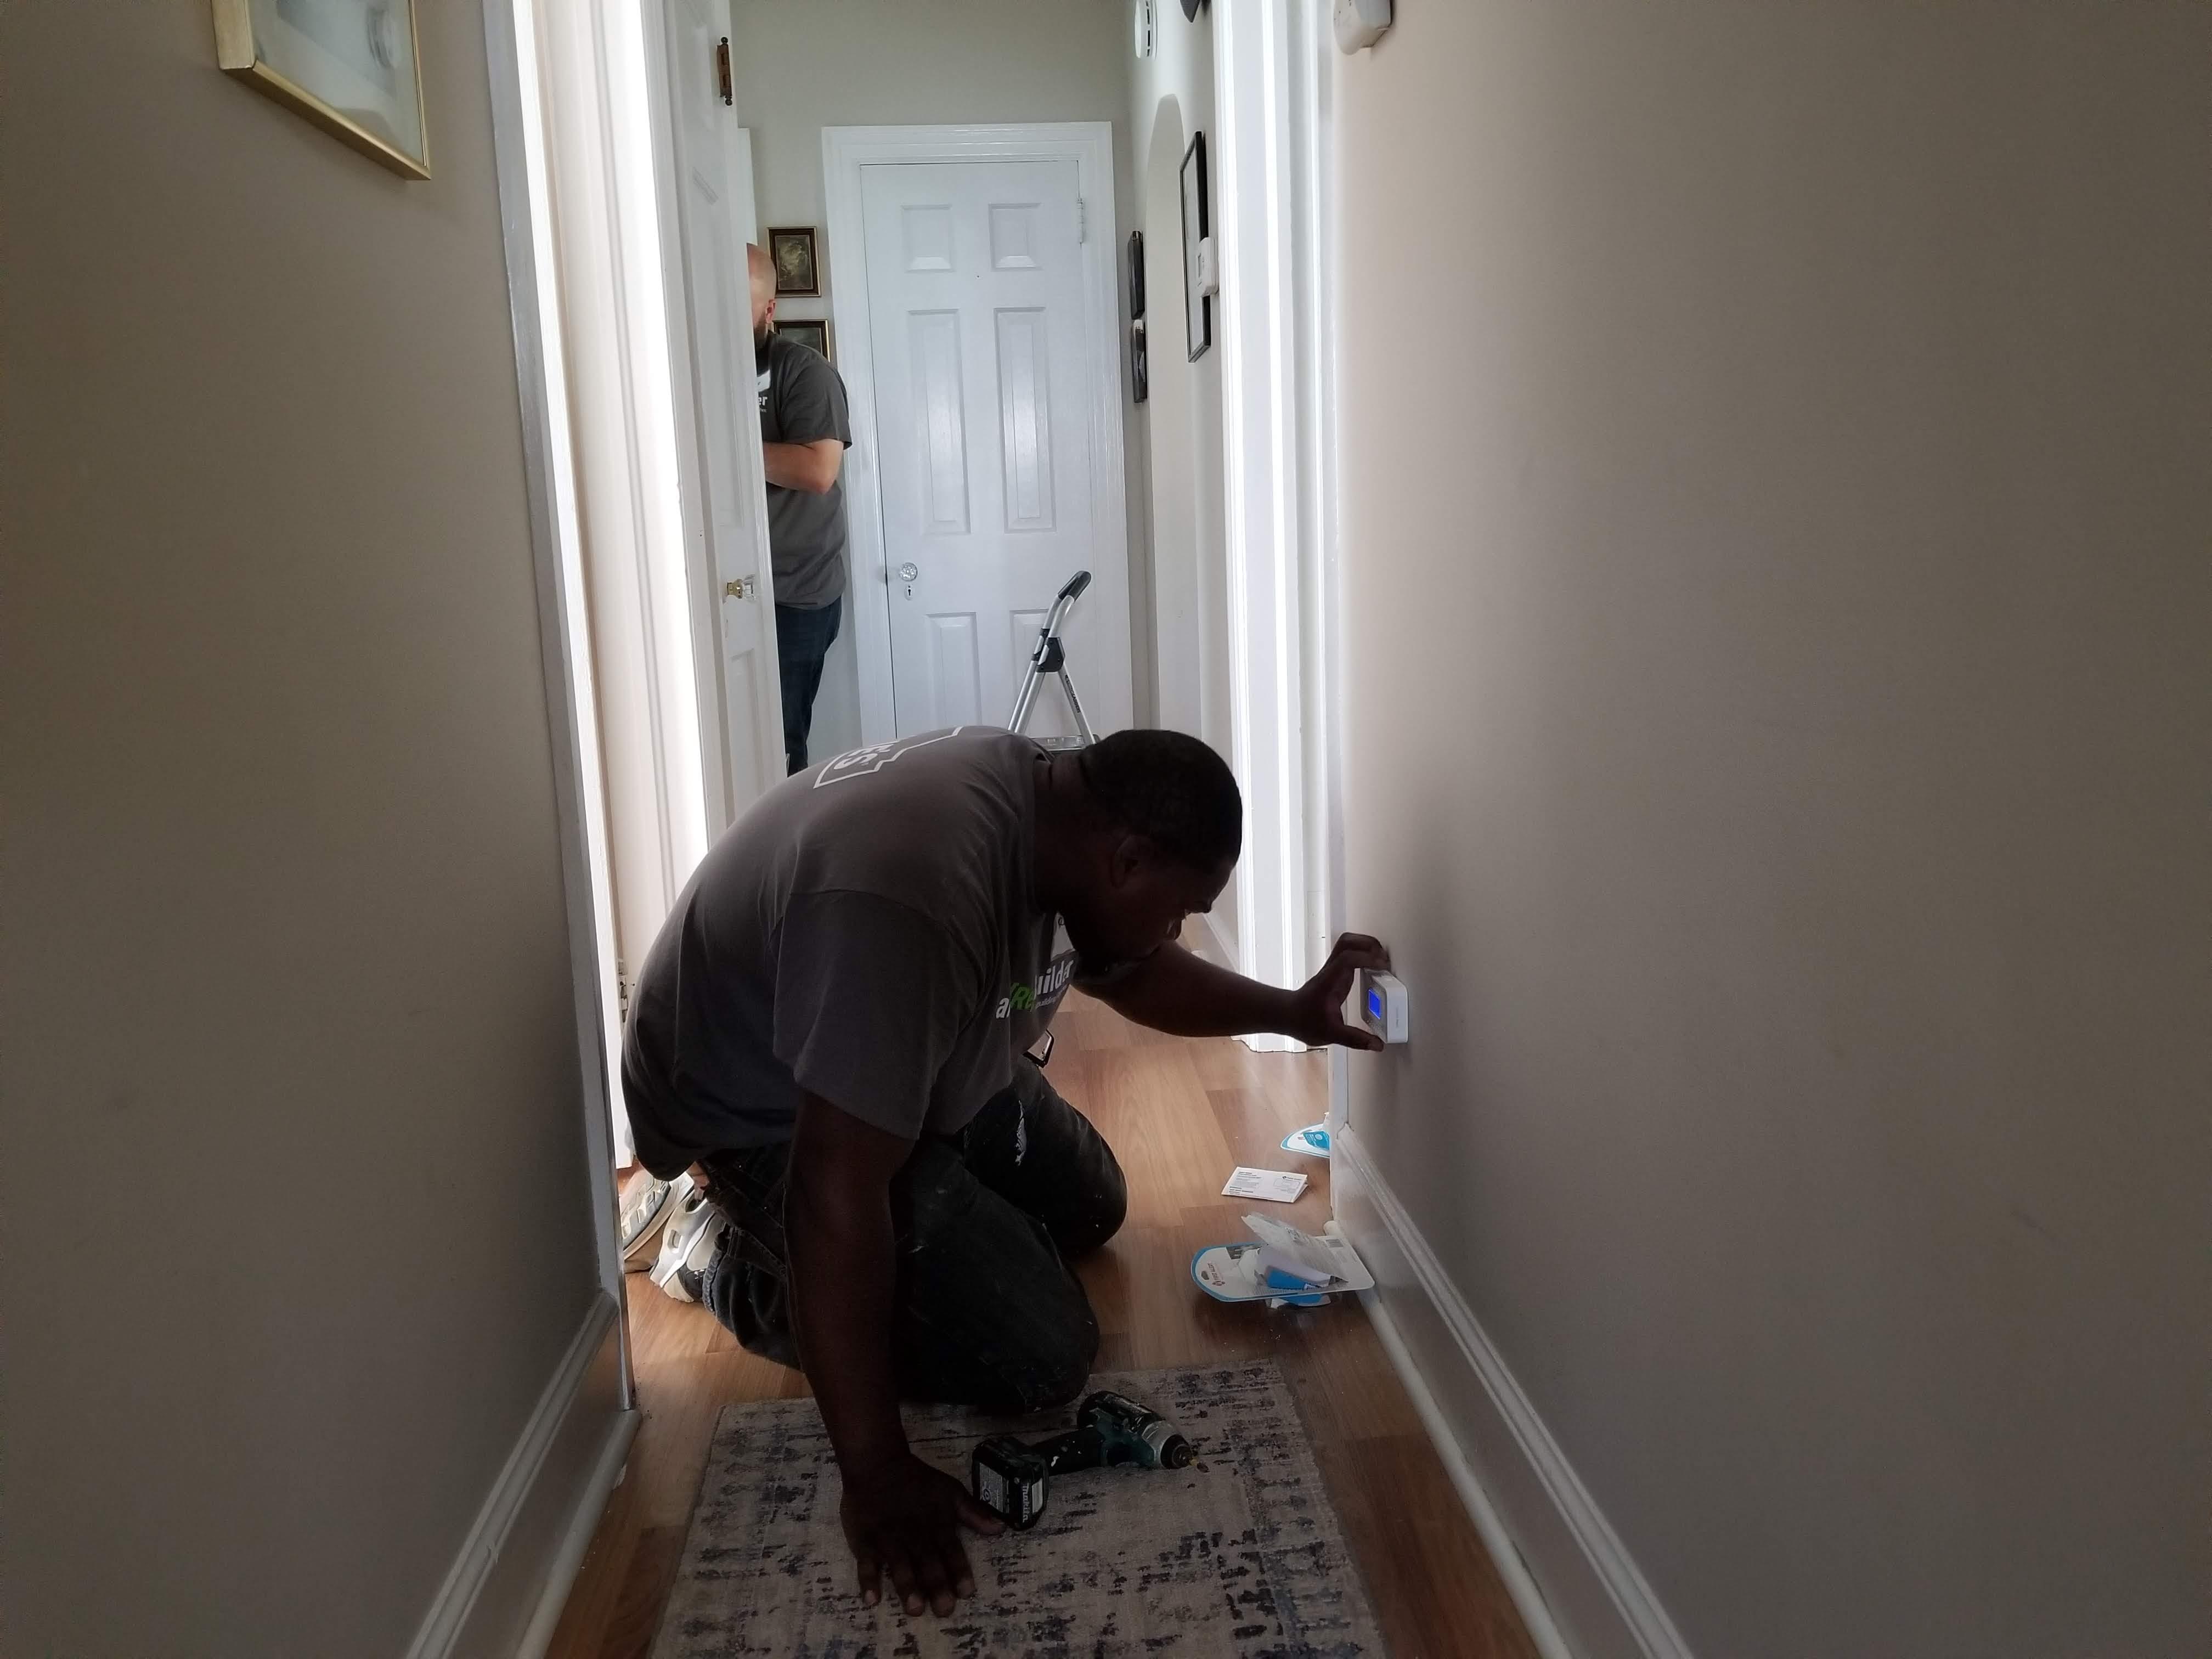 A State Farm volunteer installs a carbon monoxide alarm